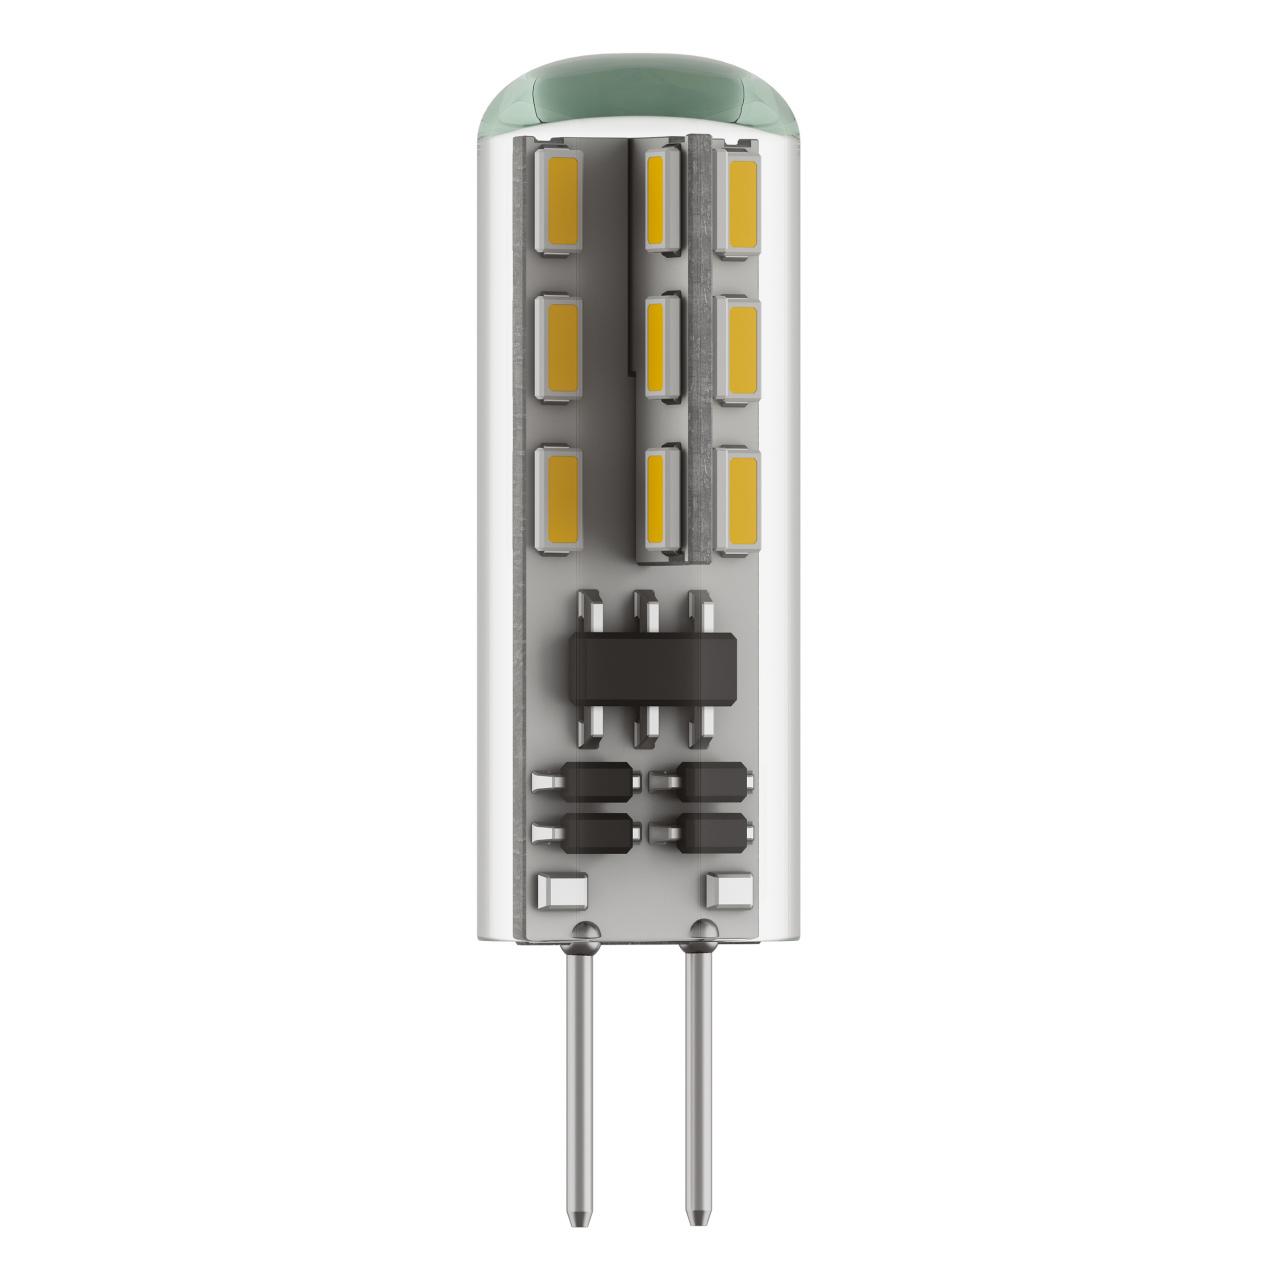 Лампа LED 12V JC G4 1.5W=15W 110LM 360G RA85 3000K 20000H Lightstar 932502